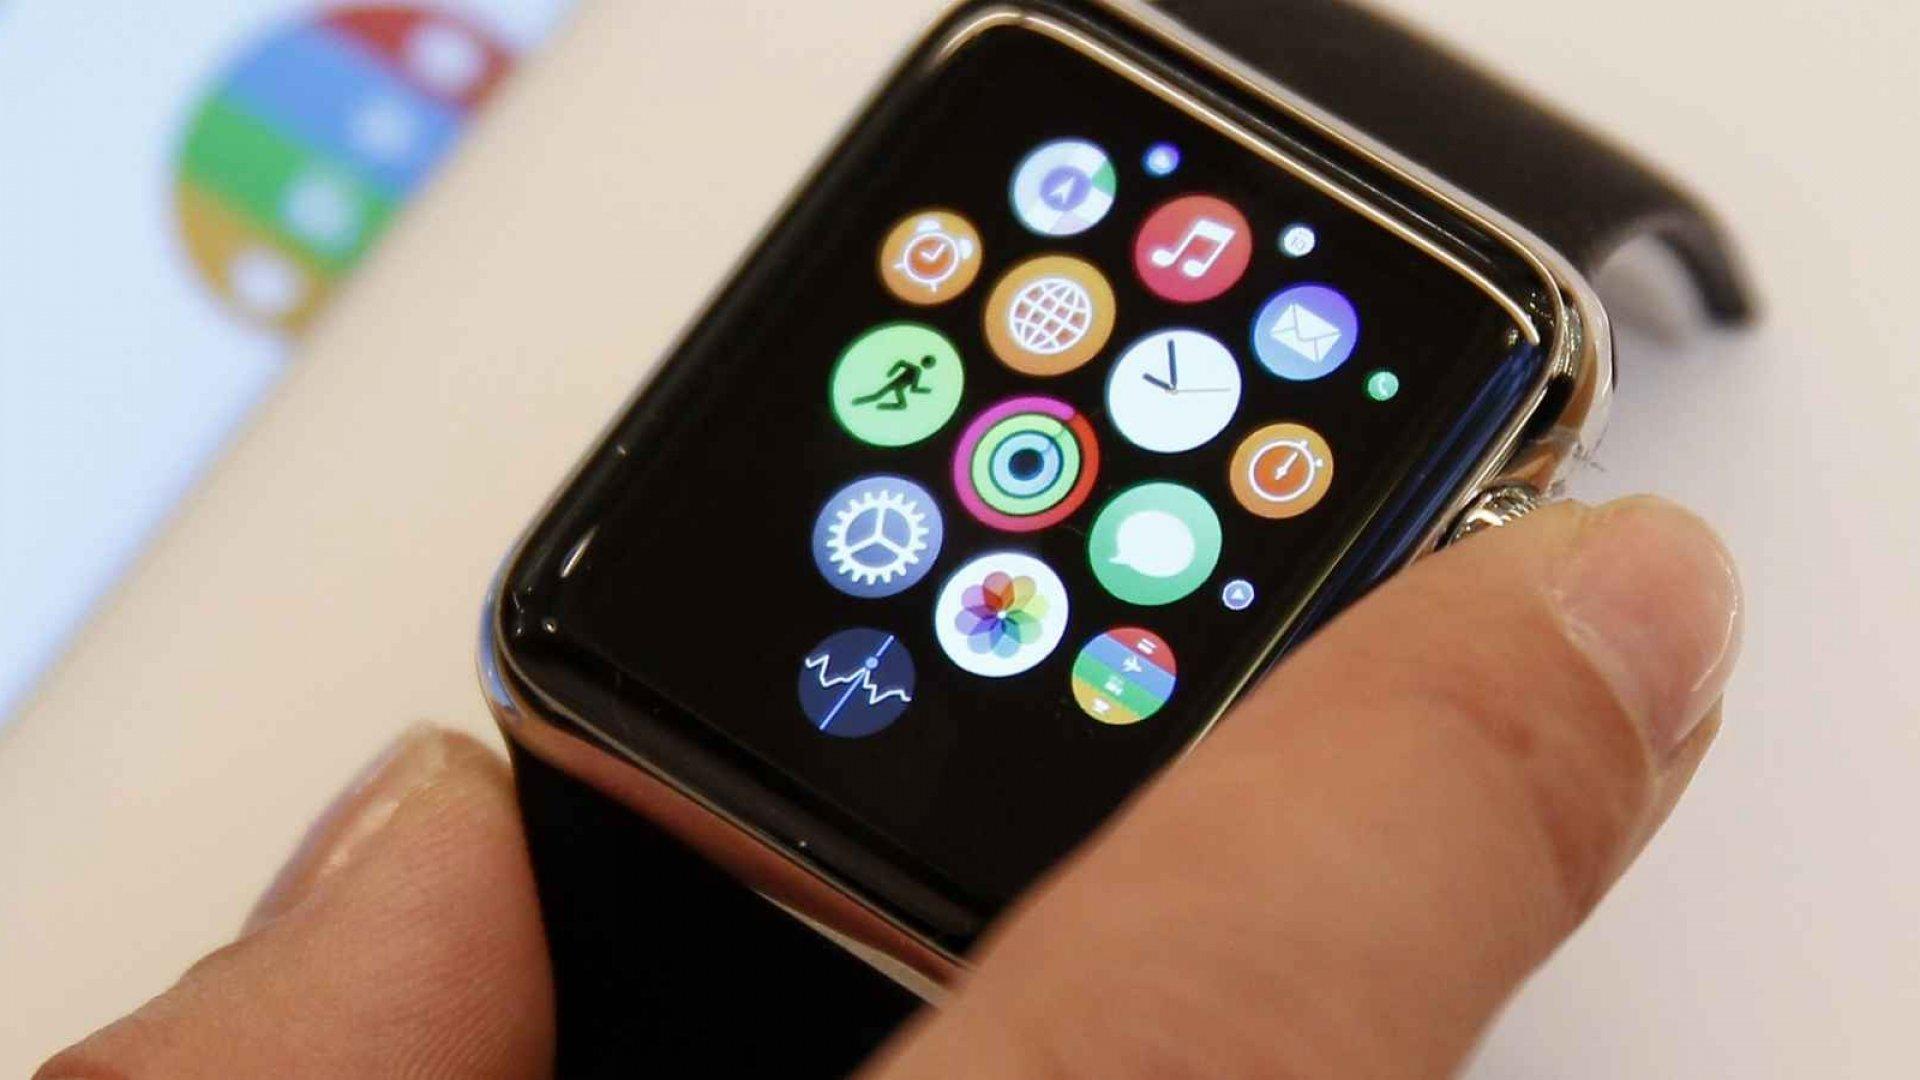 Five Failures Unwinding the Apple Watch